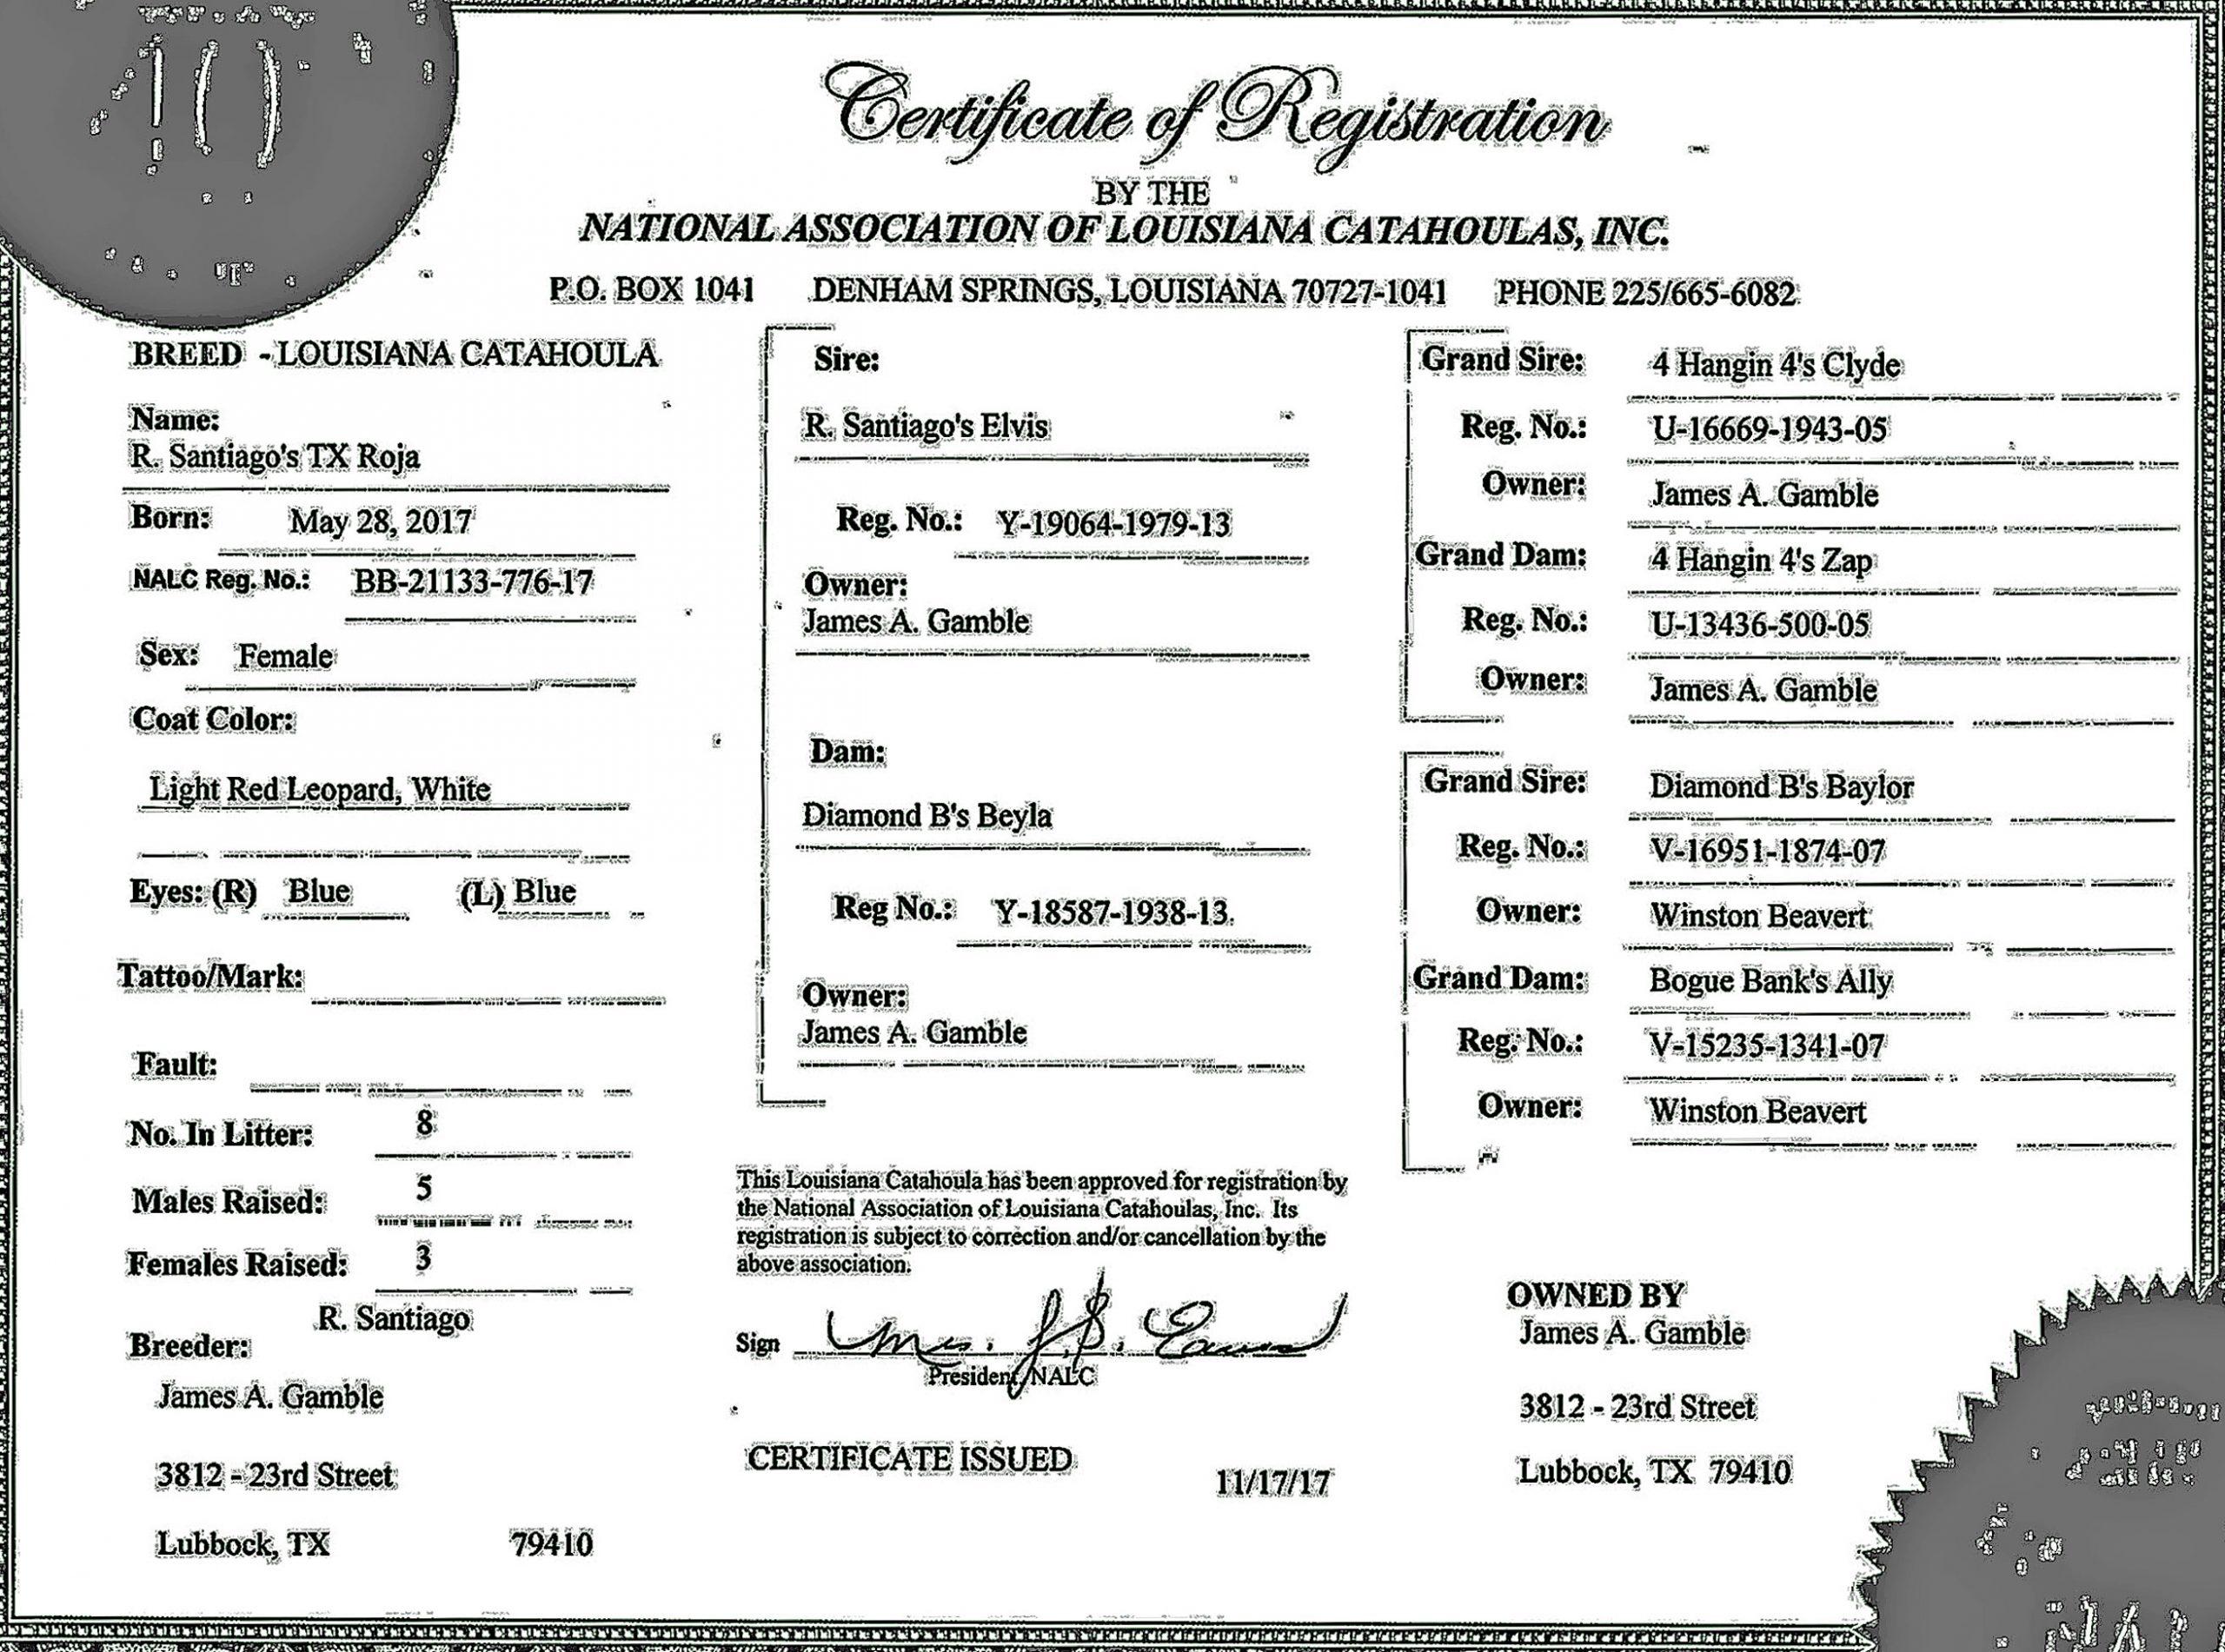 Rancho Santiago's TX Roja Registration